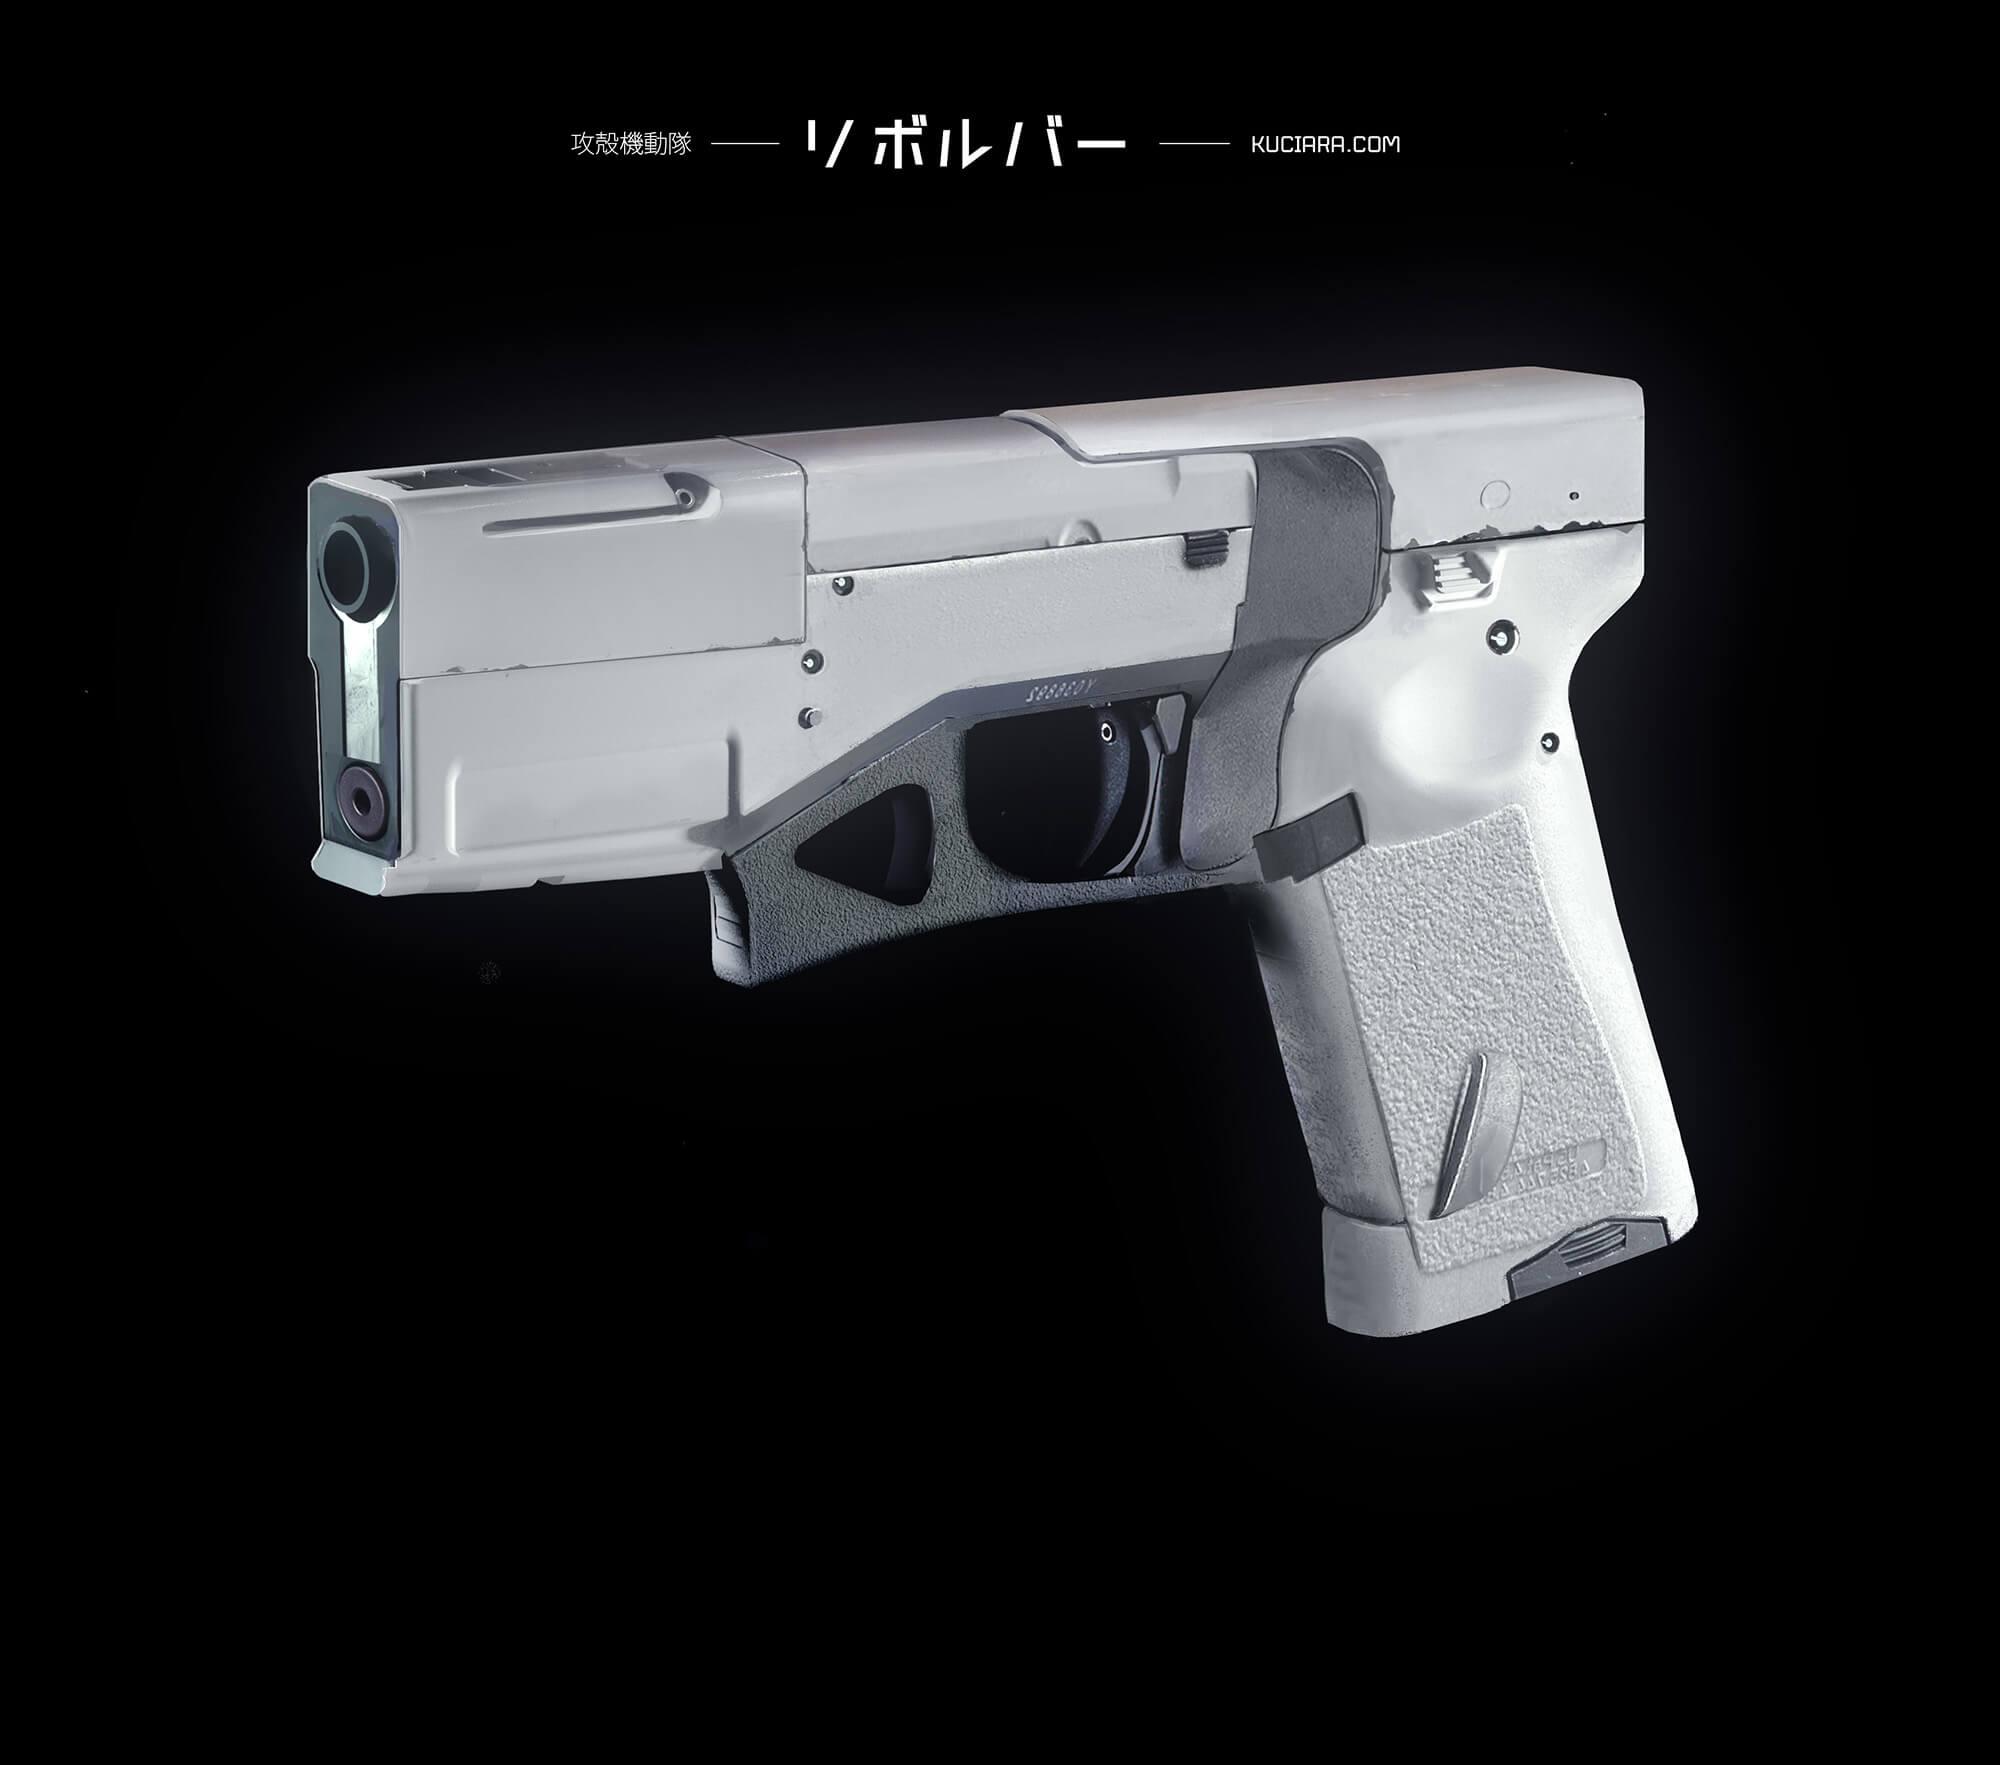 092115_WPN_Major_Pistol_MK_v001D